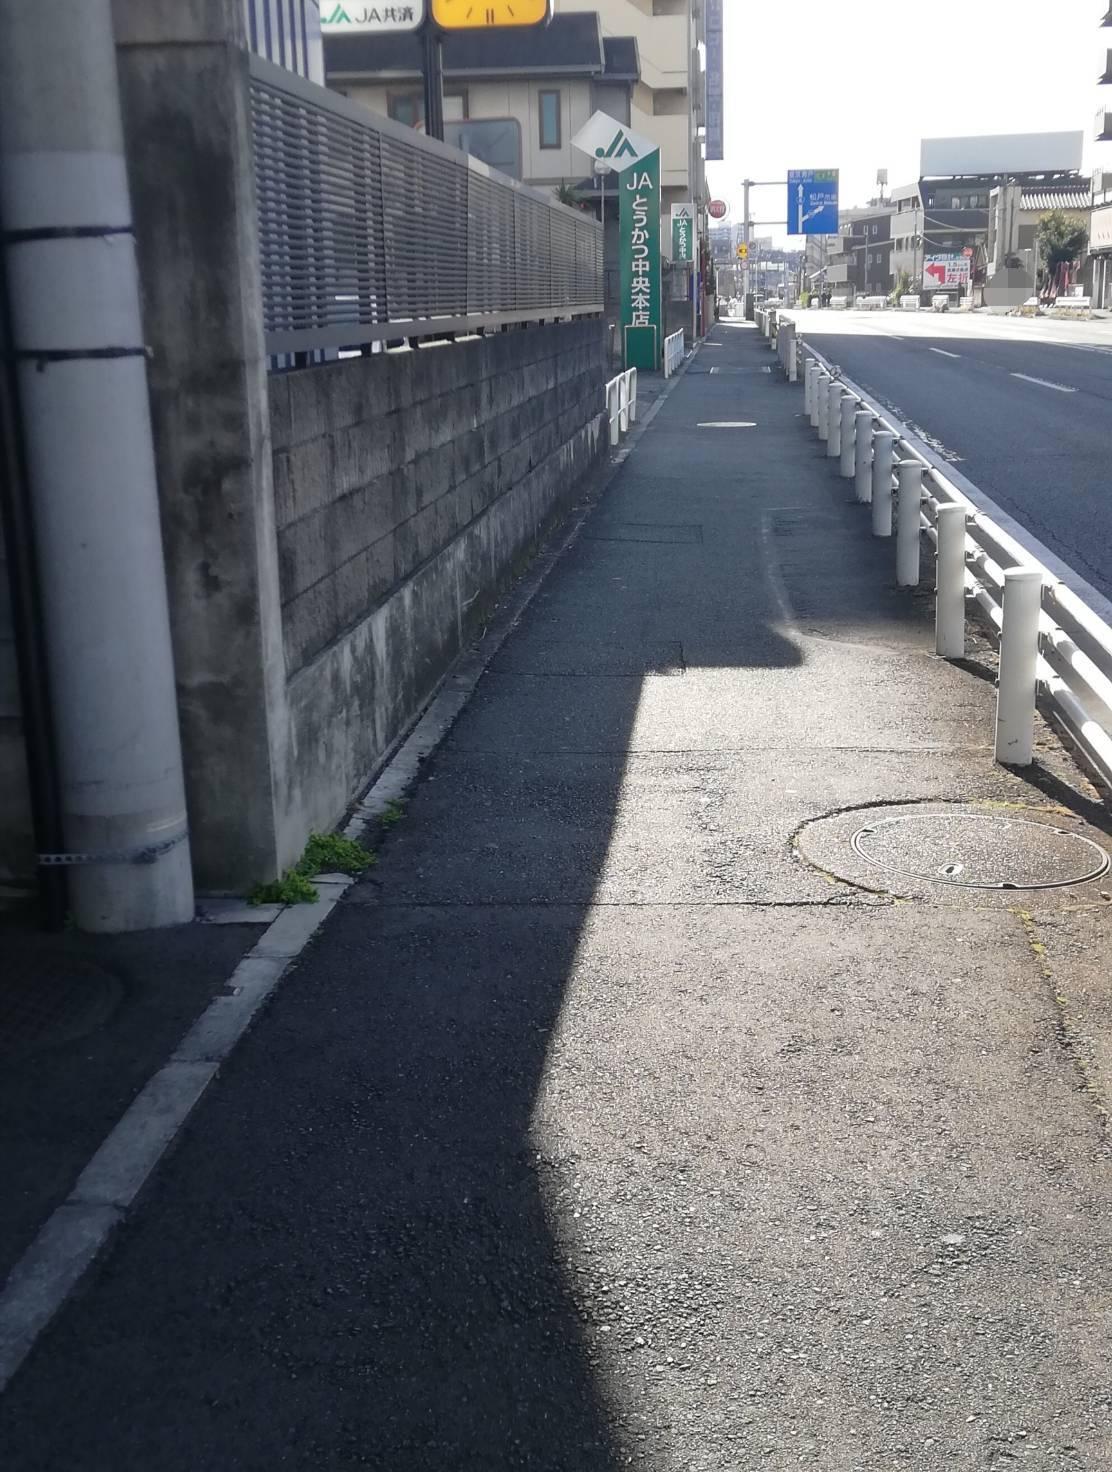 JAとうかつ中央本店北松戸国道6号水戸街道沿い